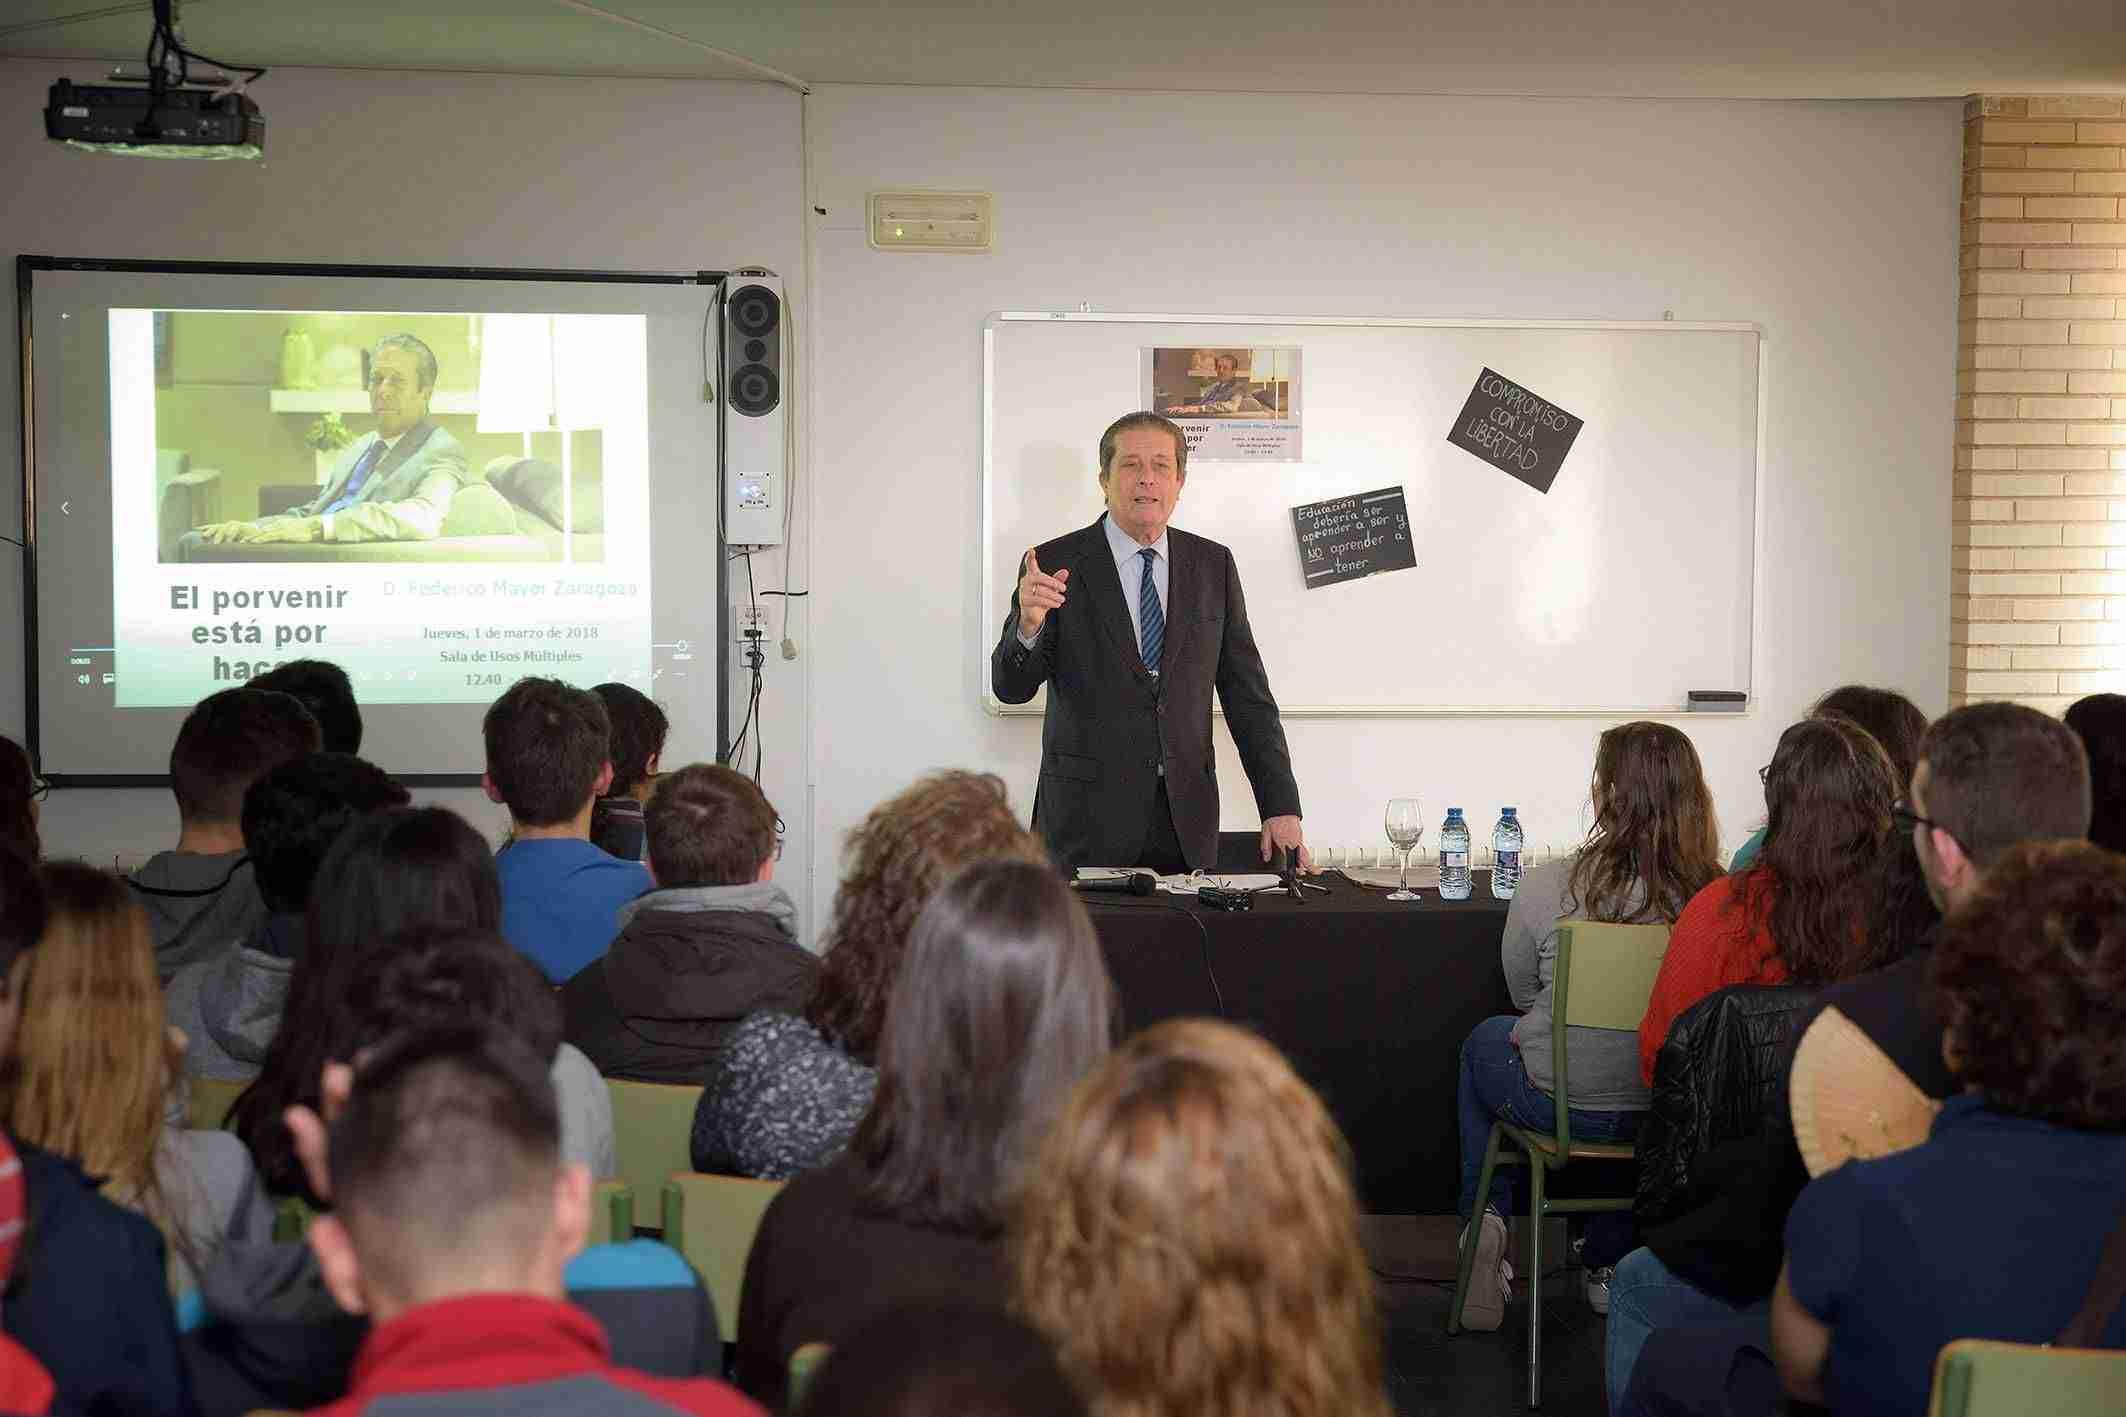 20180302_Visita IES_Federico Mayor Zaragoza02_AdeAlba 1